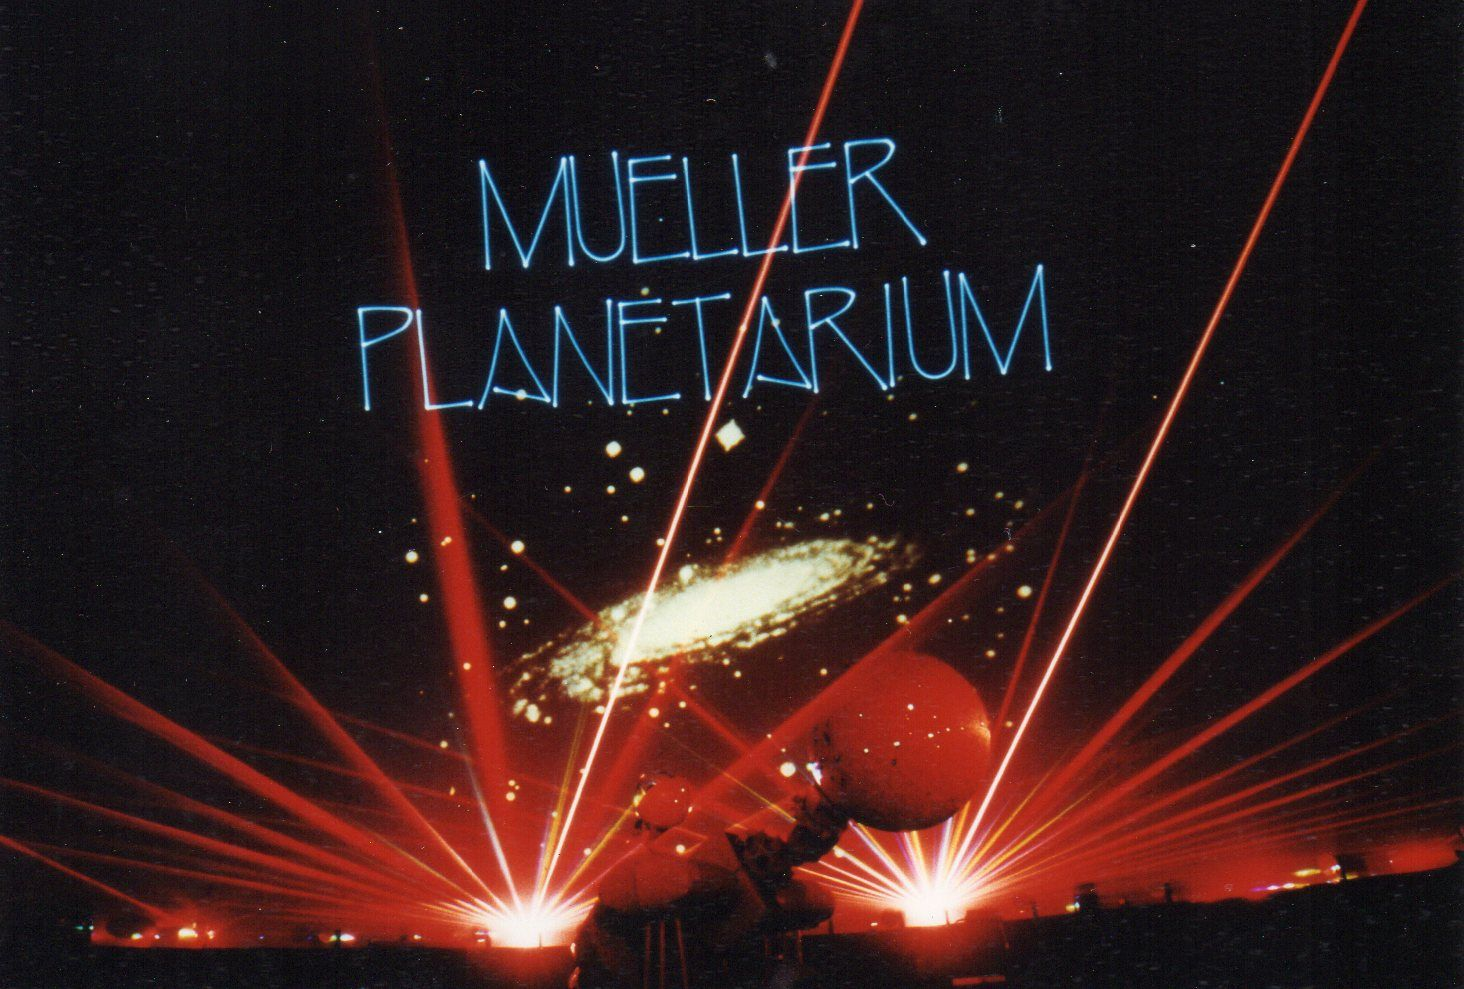 Laser show promotion (1980s)